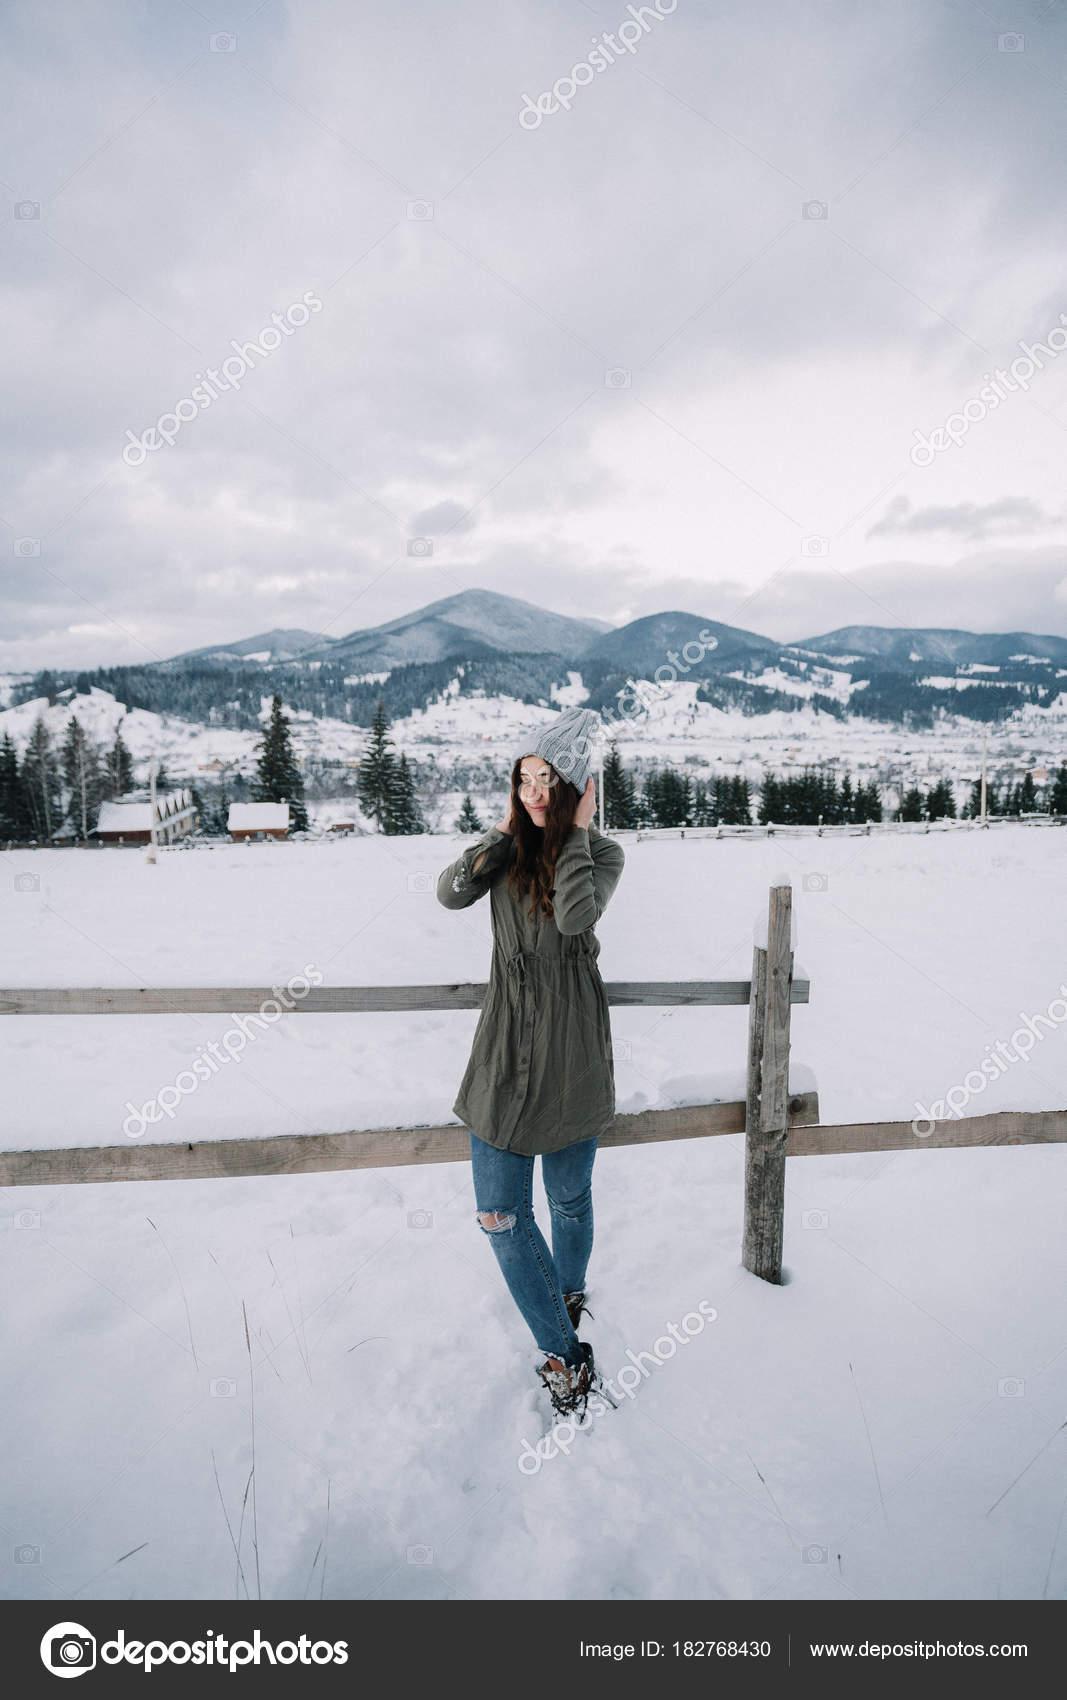 5d97b278a357 Happy νεαρό κορίτσι στο πράσινο πουλόβερ απολαμβάνει το χιόνι.  Διασκεδάζοντας στο χιόνι. Κοντά με όμορφες Χειμερινές εξοχικές κατοικίες σε  βουνά — Εικόνα ...